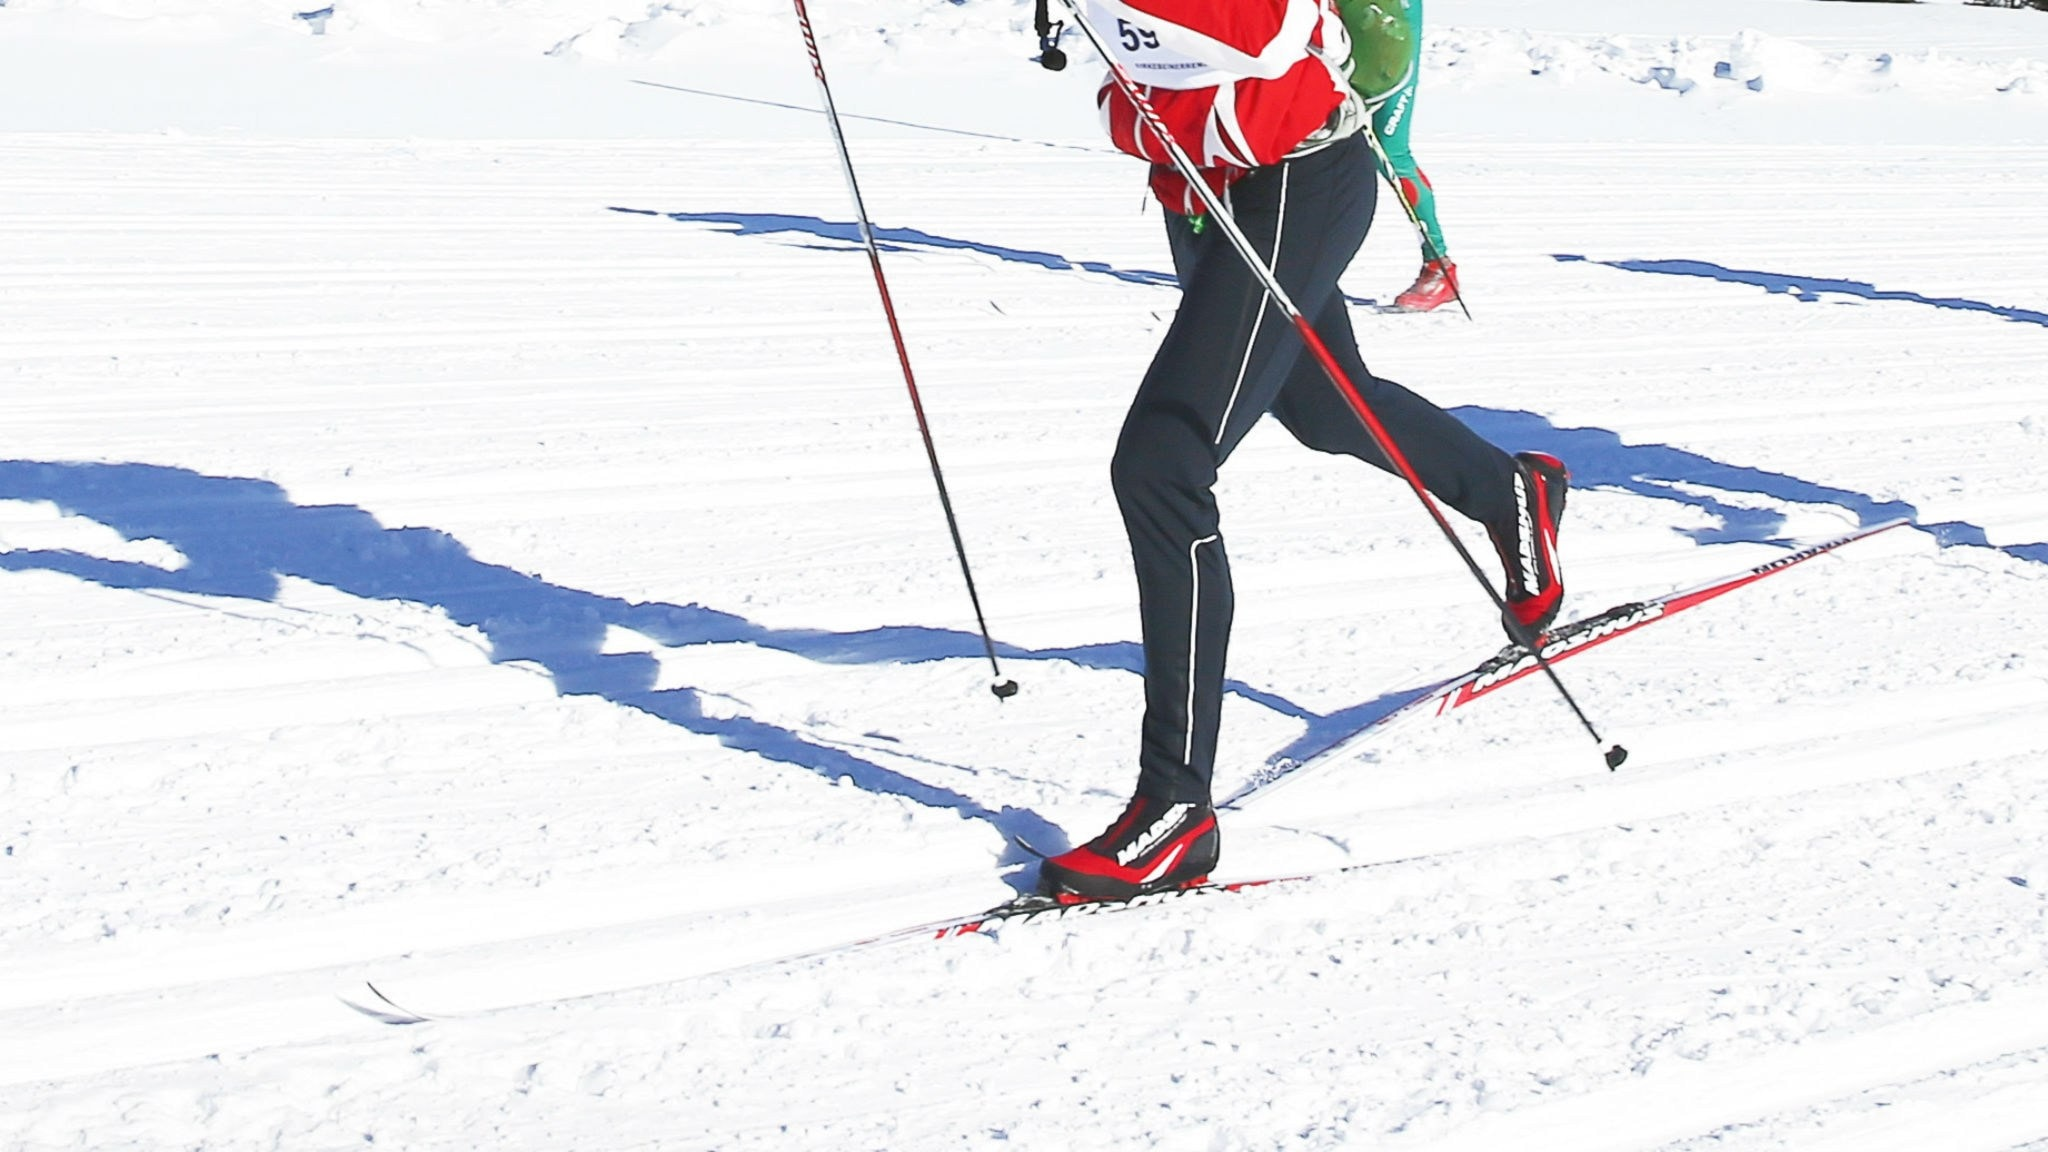 Osmo och Kyrtti tävlar på skidor – men oj,oj… / Osmo ja Kyrtti hihtovat kilpaa – mutta voi,voi ...